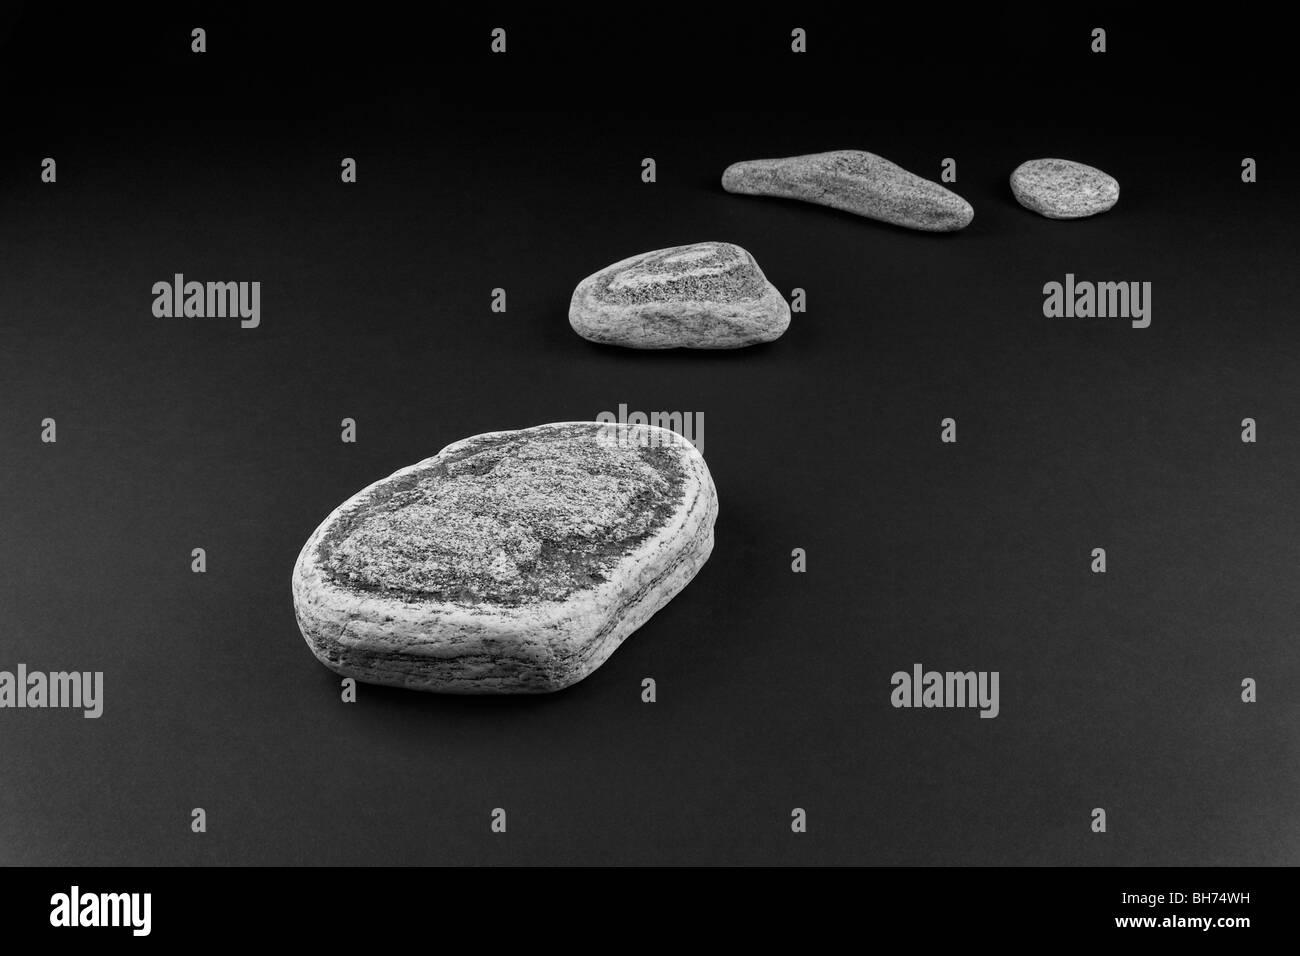 zen spirit inspired stone arrangement - Stock Image